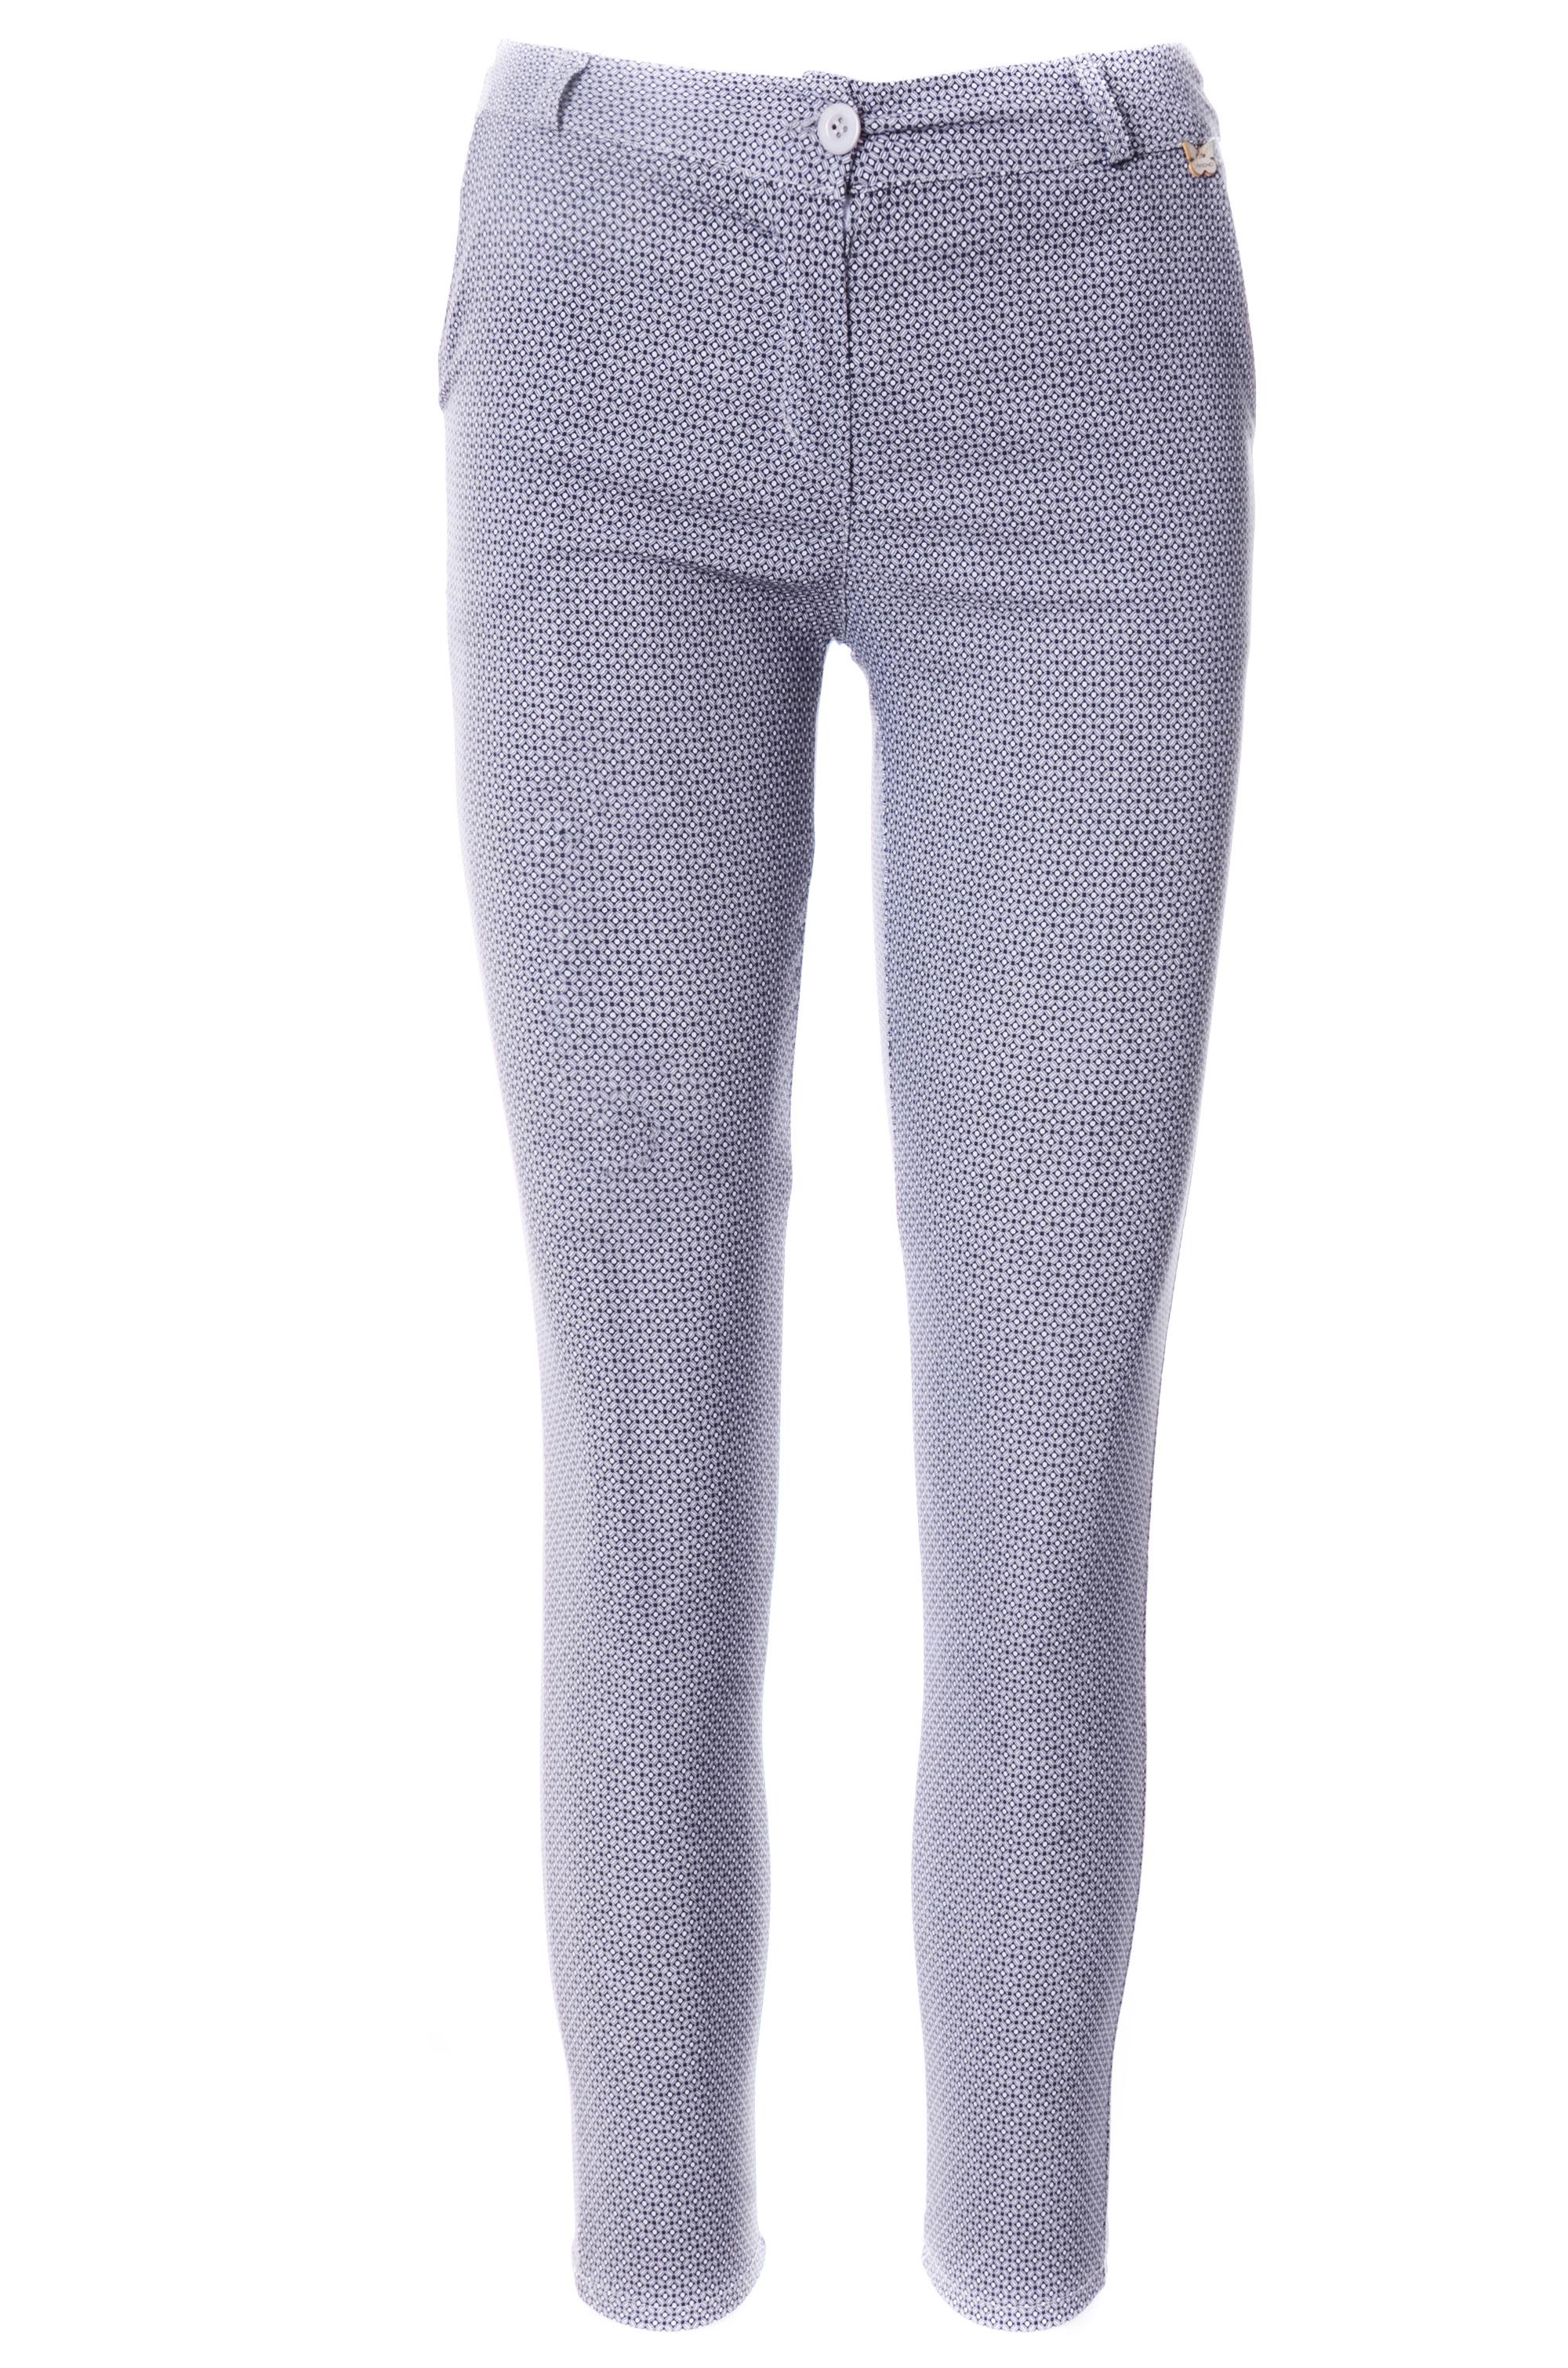 Spodnie - 54-5317 NERO - Unisono